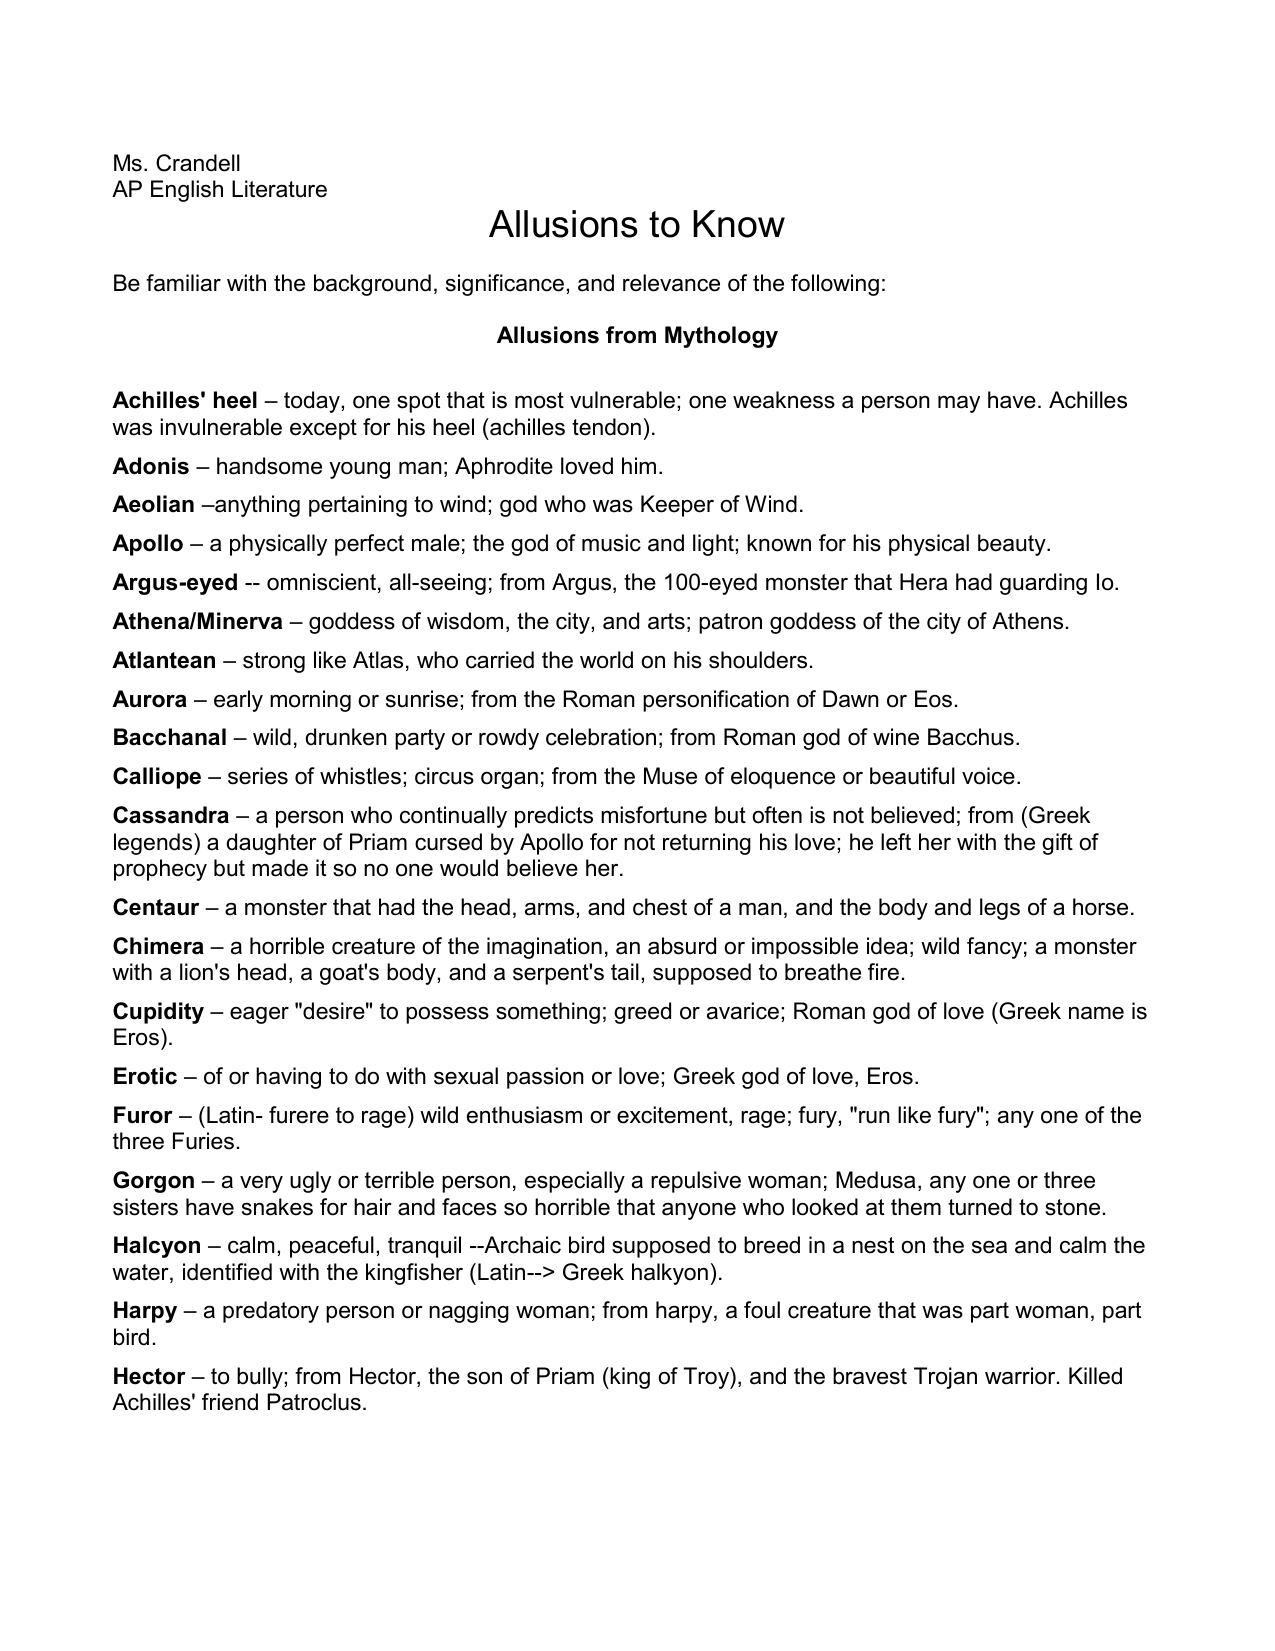 Allusions List